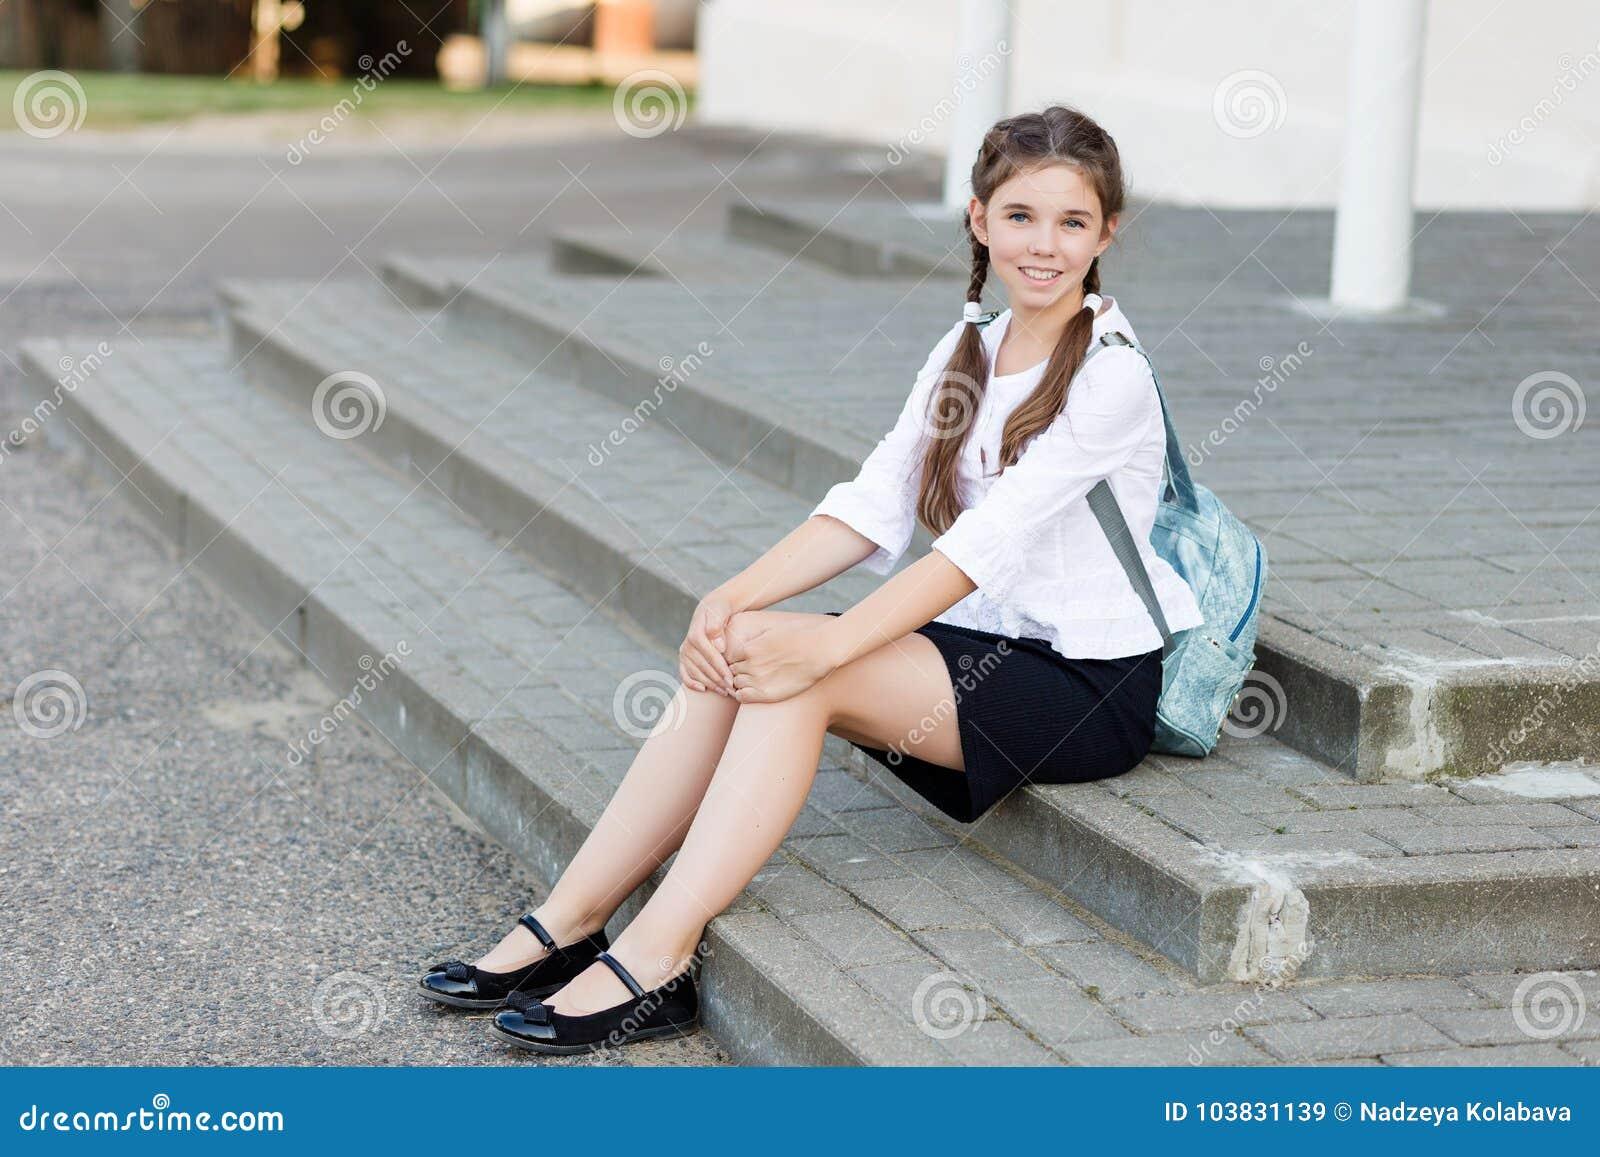 Beauty: Beautiful,Hot and Sexy School Girls